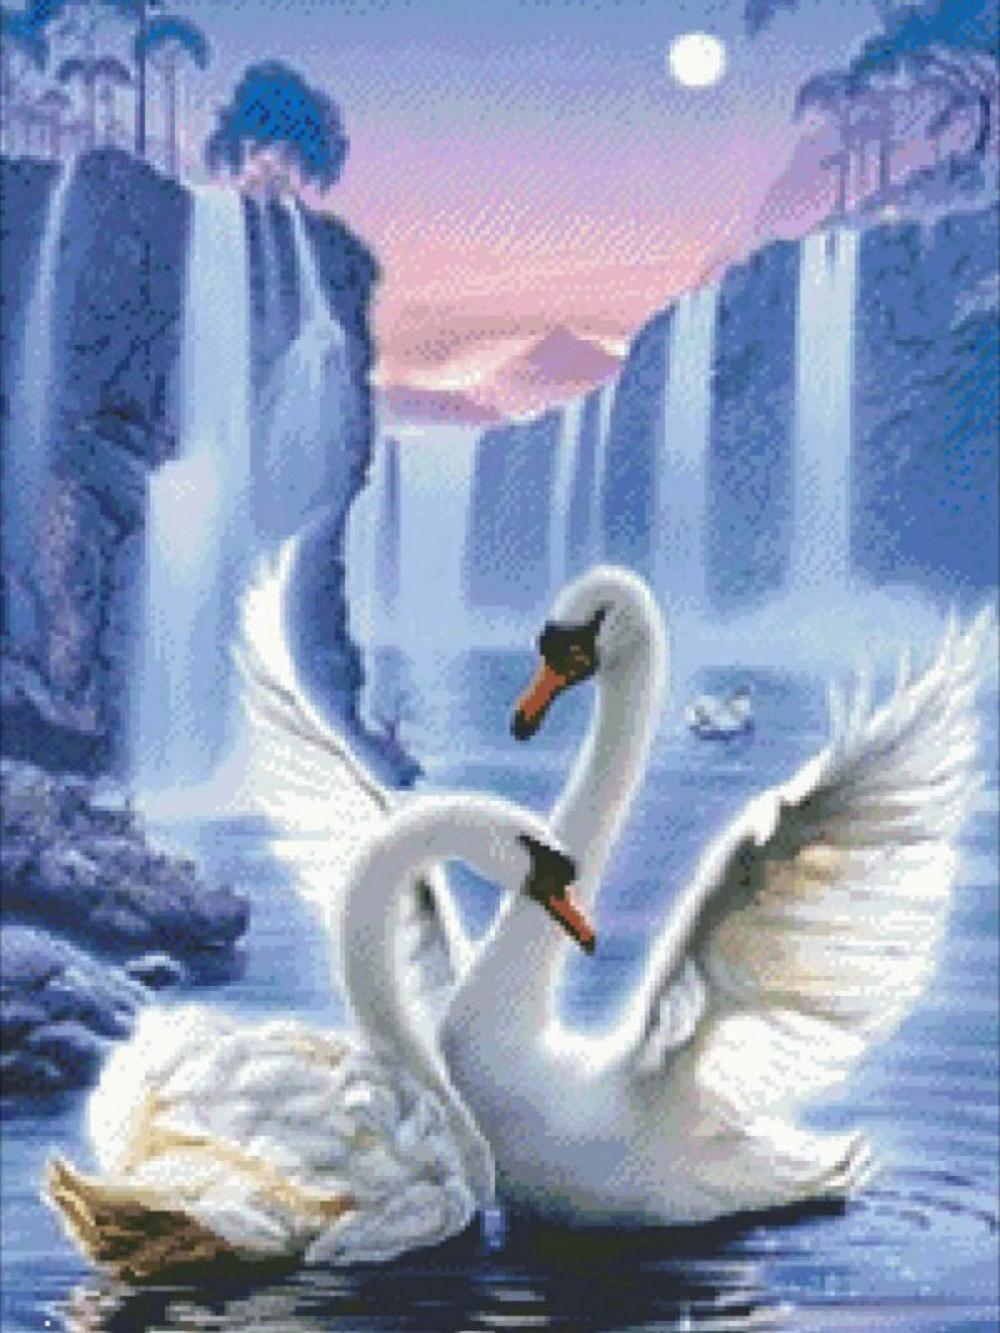 A1294 Swan 30 * 40 CM 5D DIY Beste Diamant Stickerei Malerei Wohnkultur Diamant kreuzstich 100% Harz Werkzeug dril Malerei Mosaik Hand